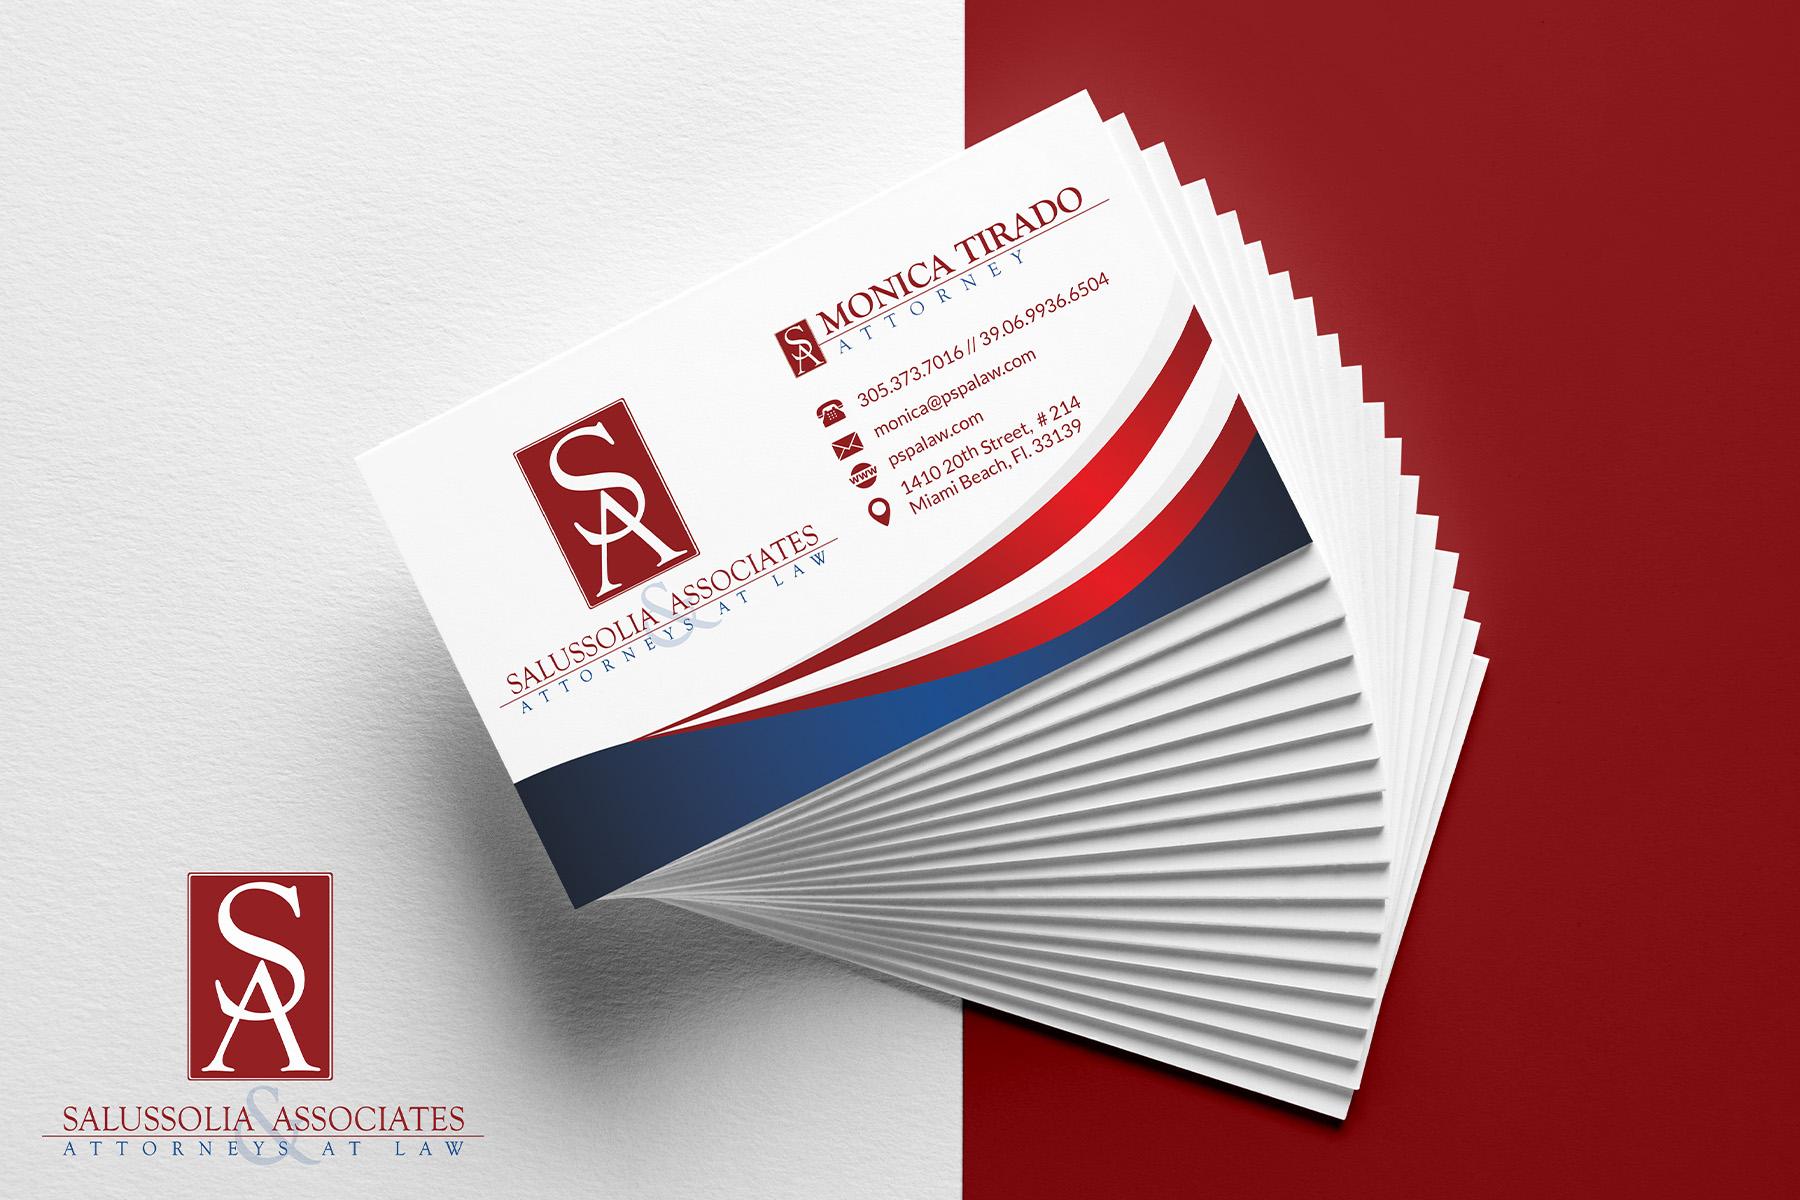 browardmarketing marketing advertising clients _0001_salussolia and associates business cards techmarket media